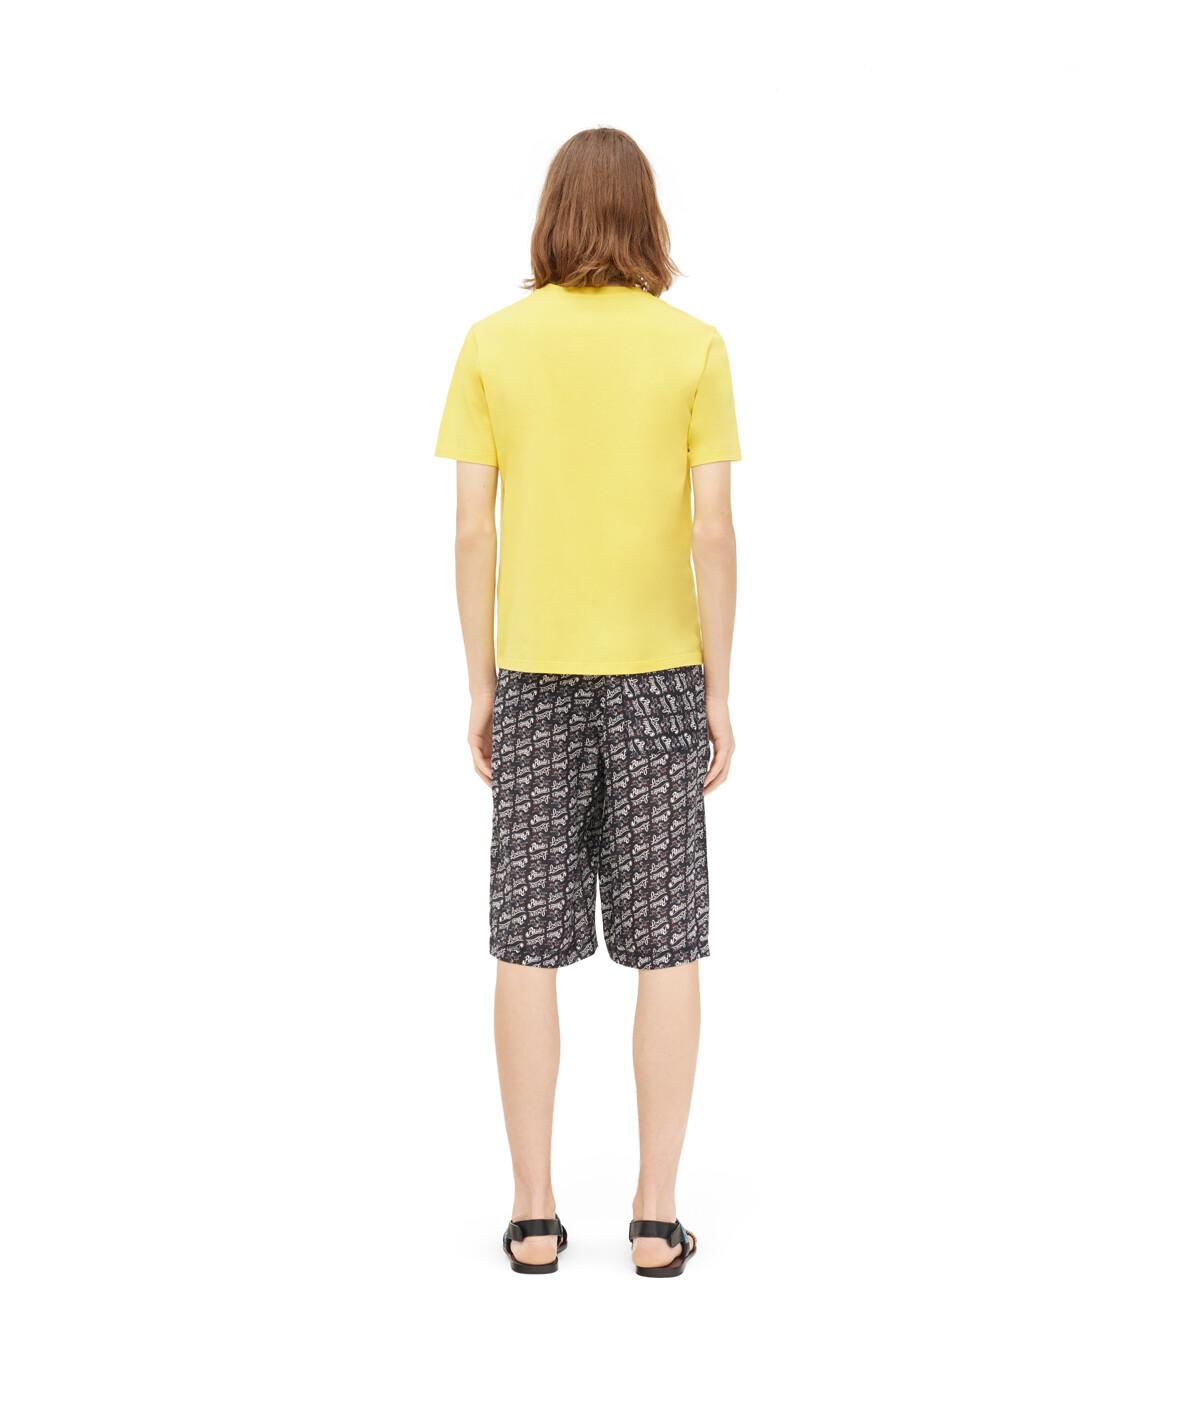 LOEWE Paula T-Shirt Amarillo front